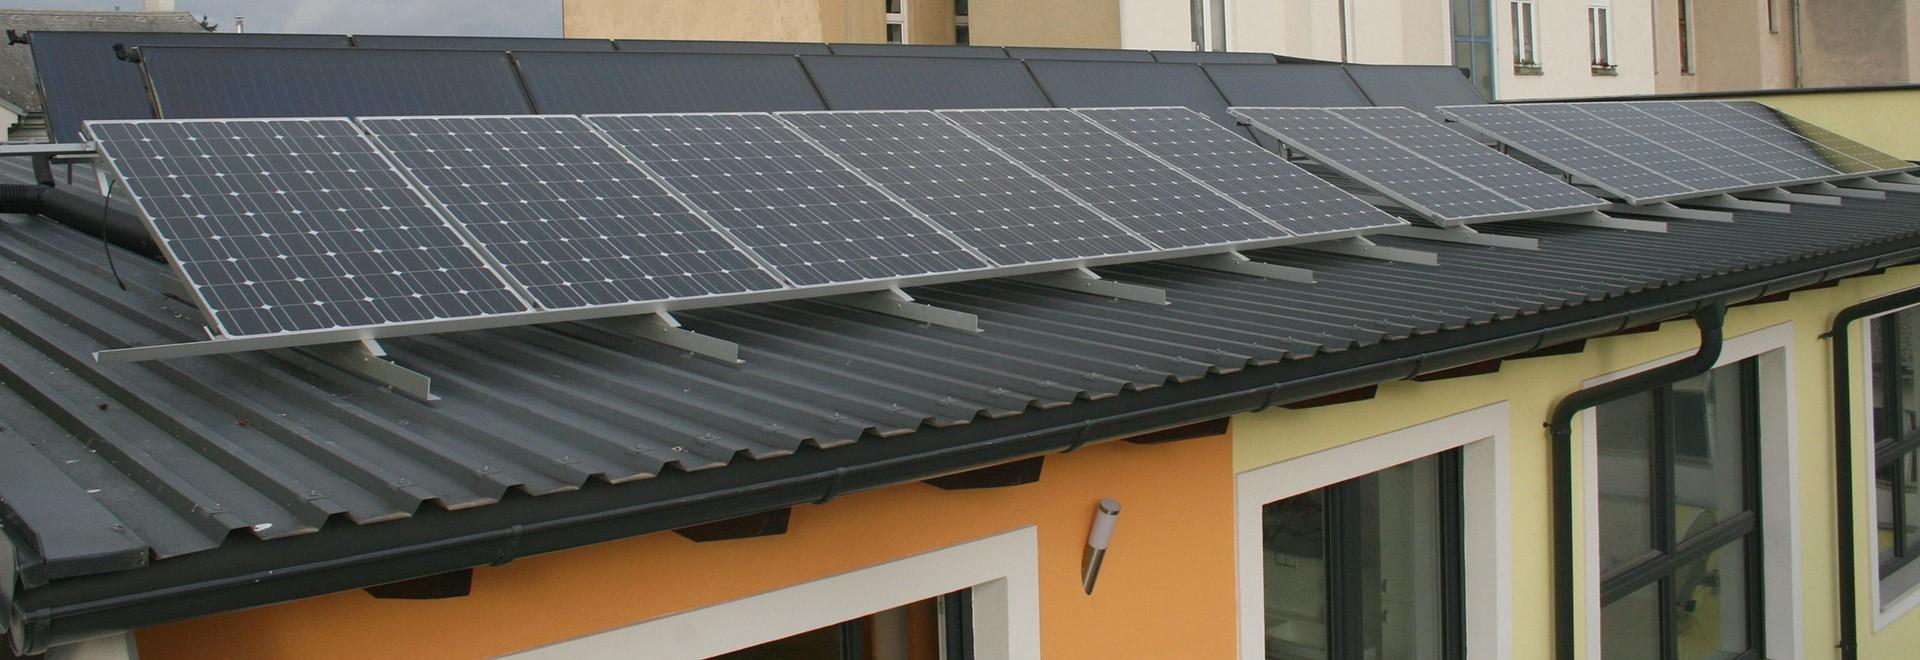 Hinteregger-Estec Ges f Energiespartechnologie GmbH